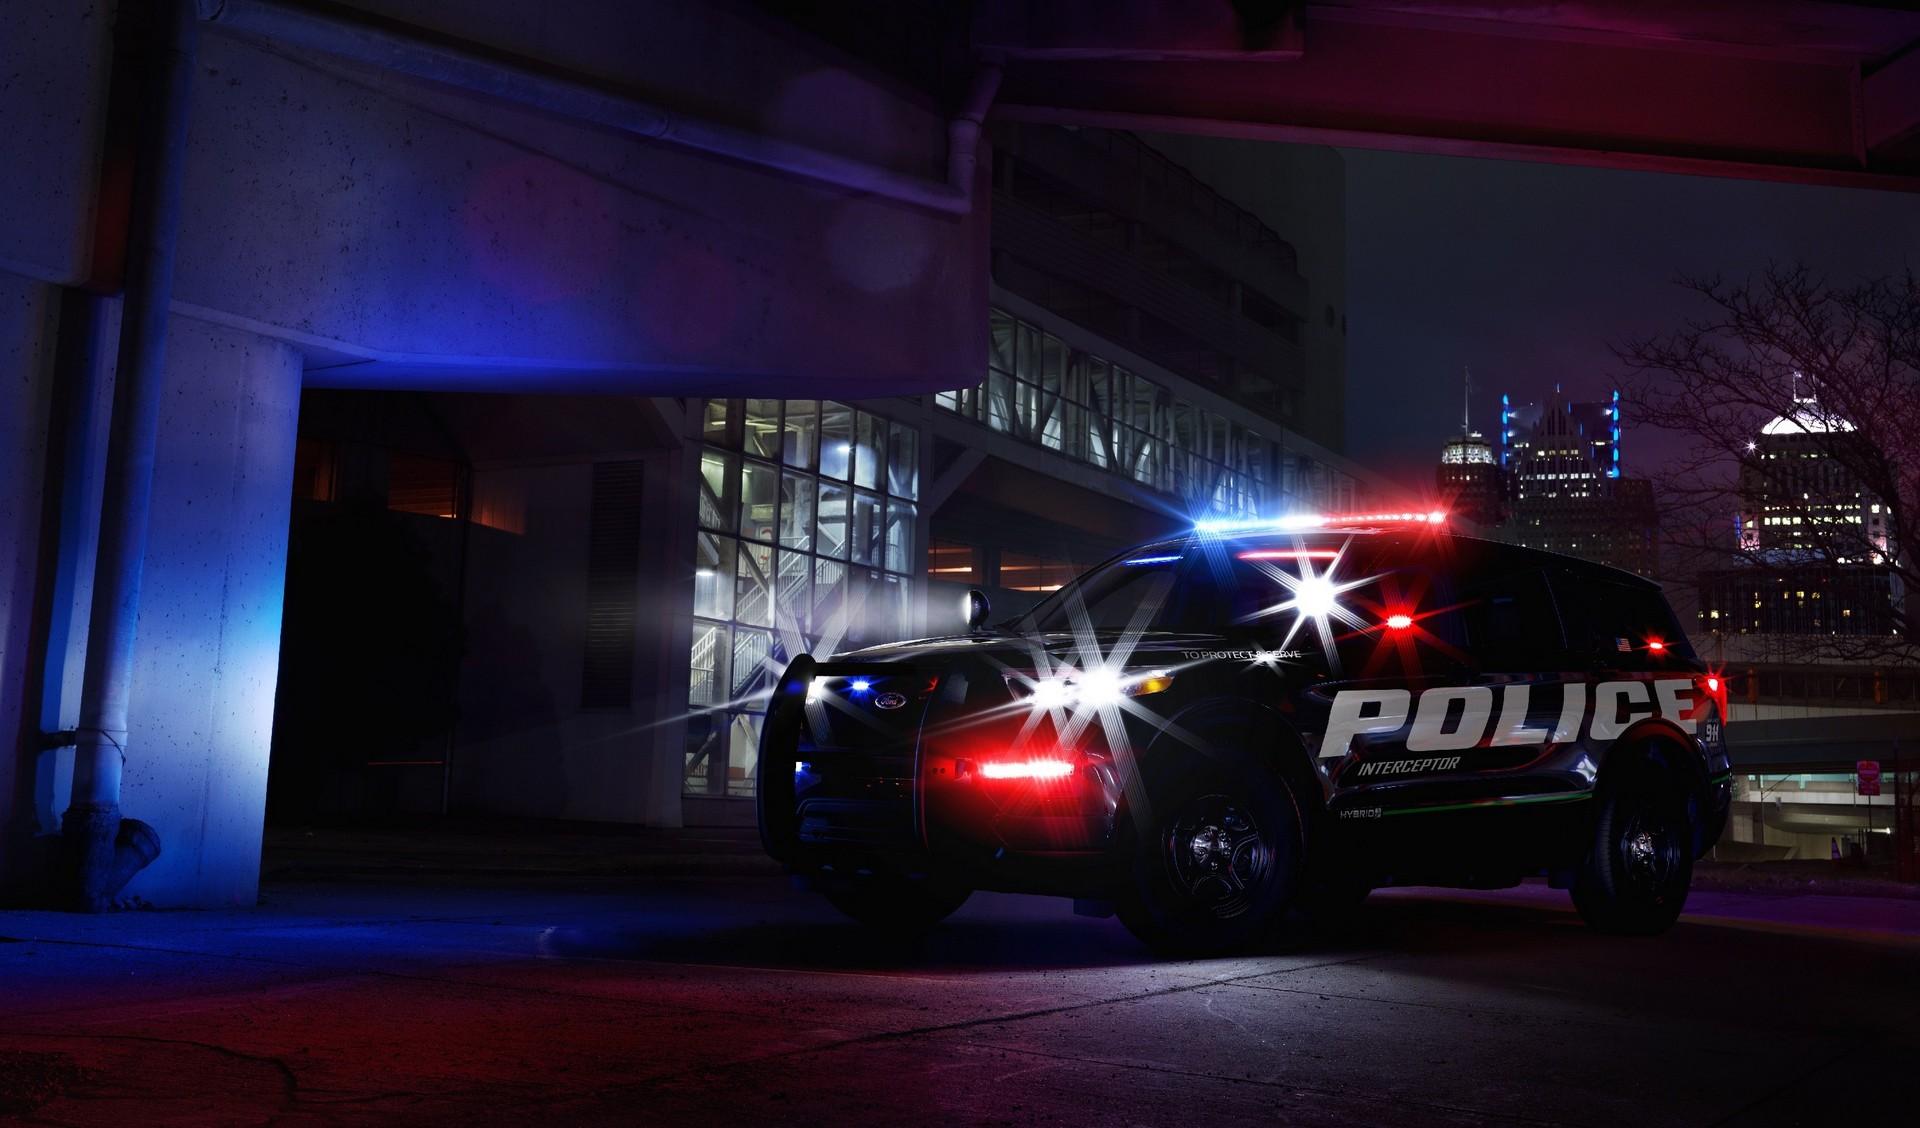 2020 Ford Police Interceptor Utility Hybrid V6 Confirmed - autoevolution